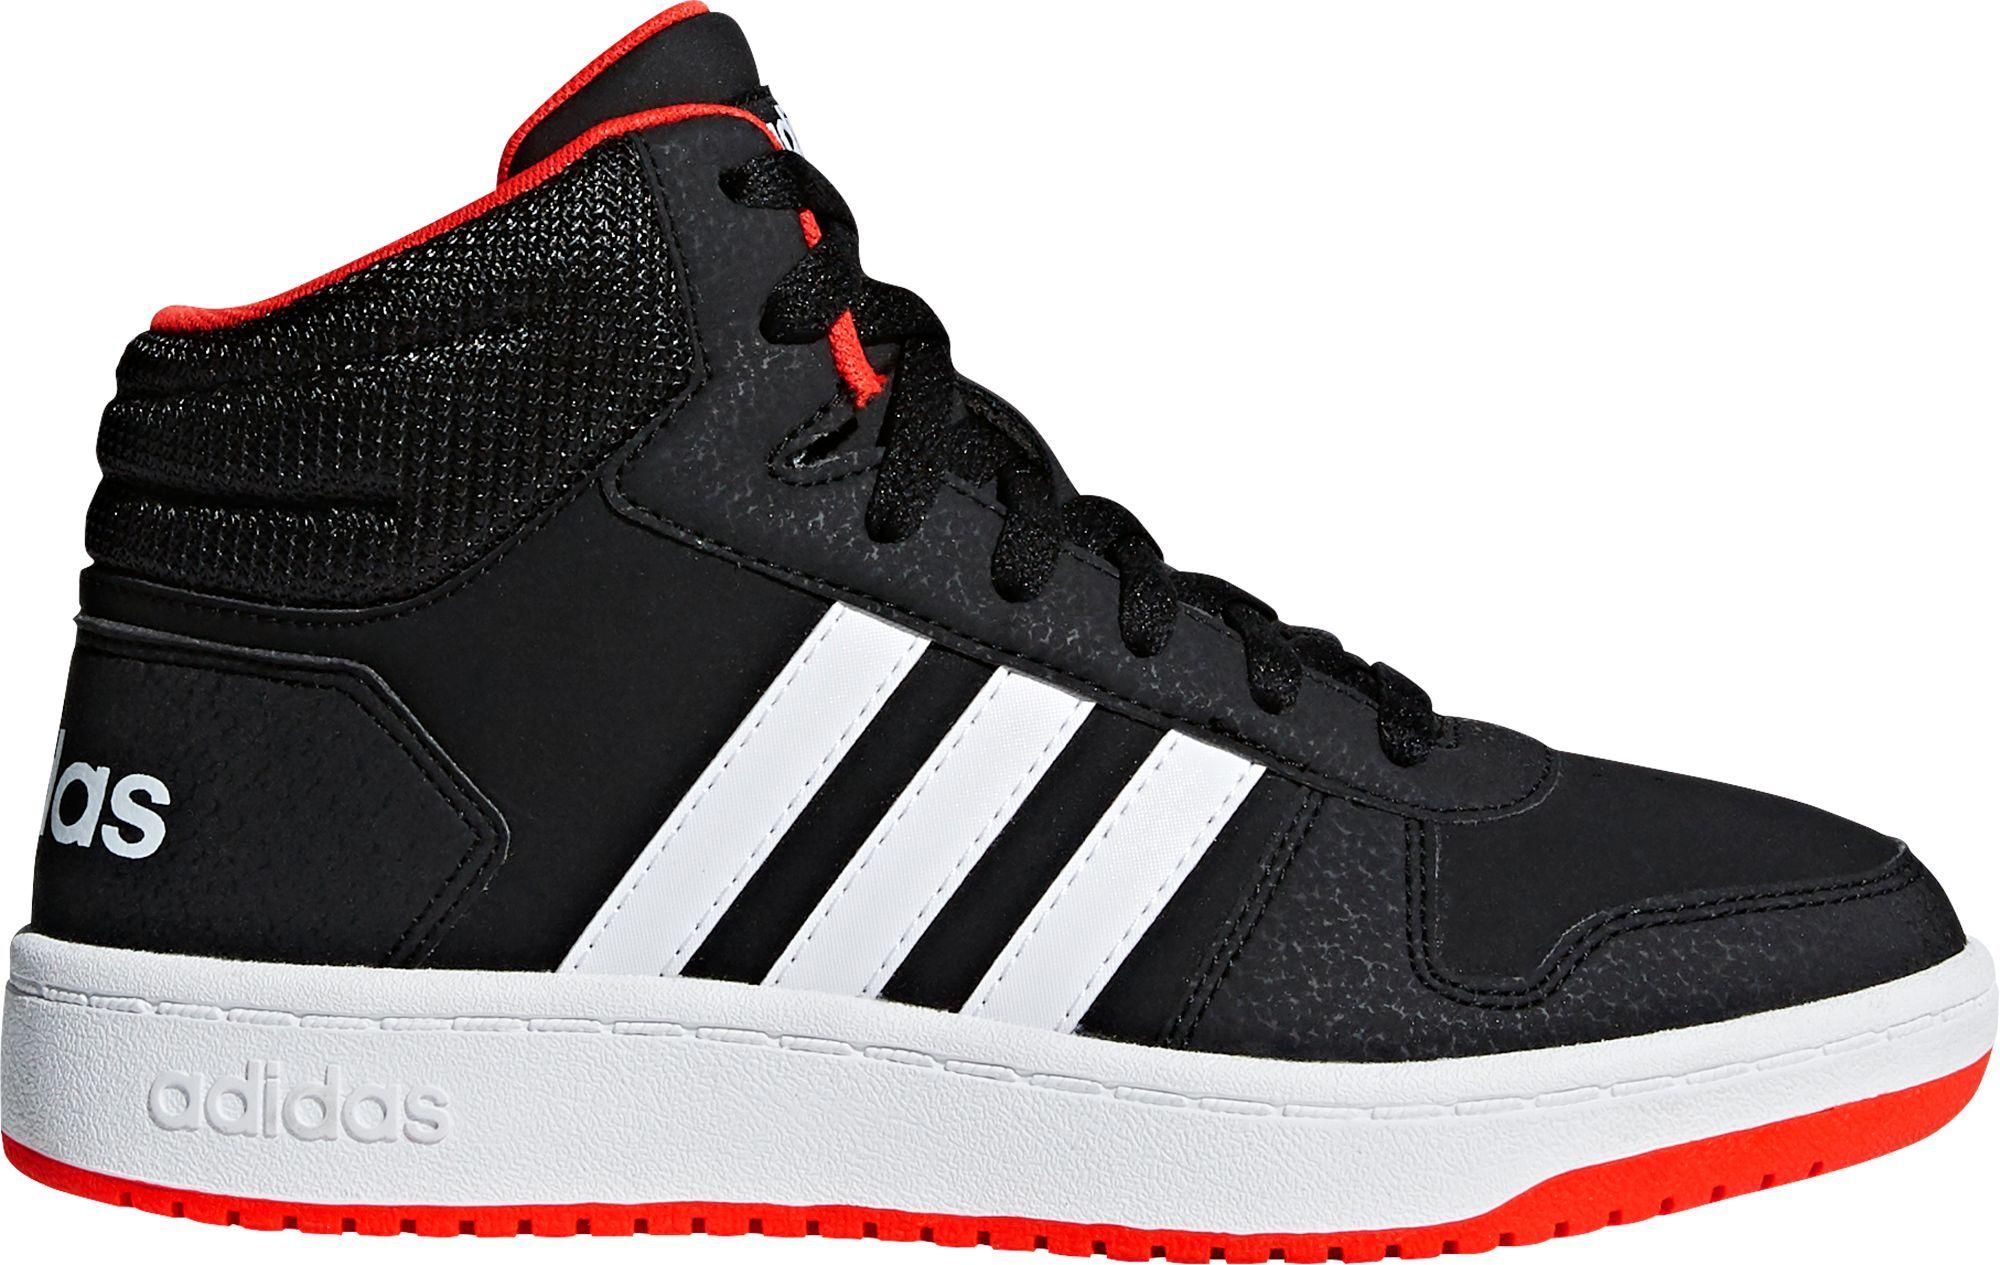 adidas Kids' Preschool Hoops 2.0 Mid Basketball Shoes, Size